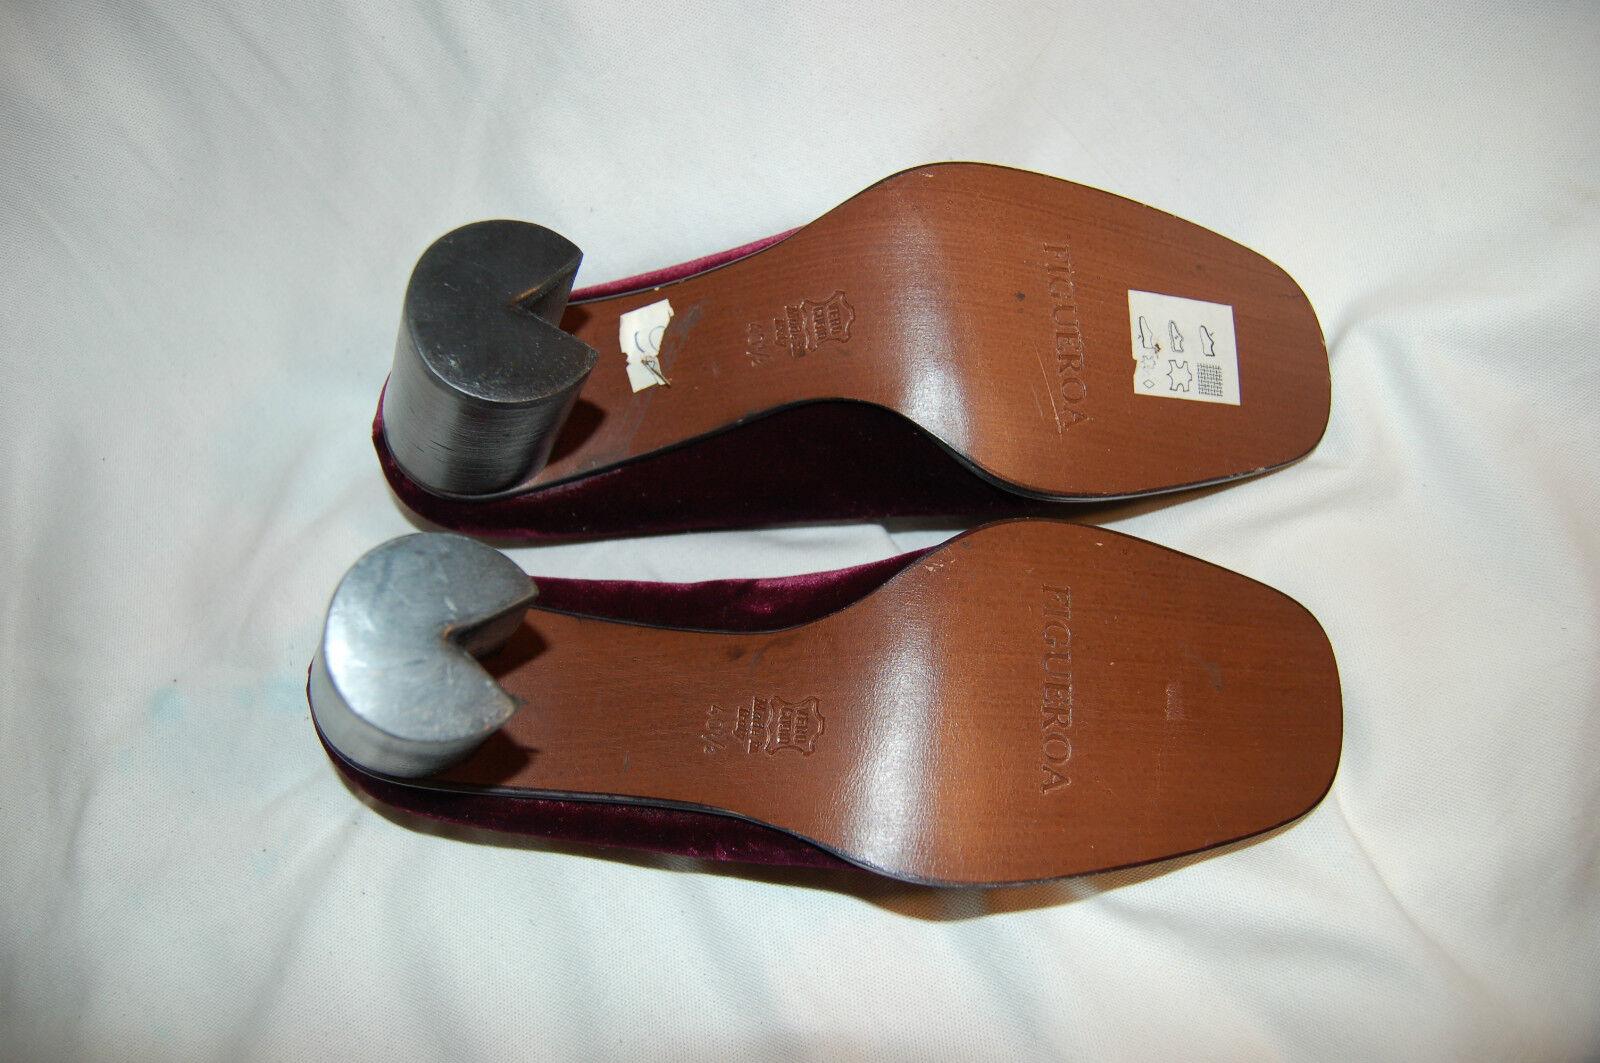 NWOB Figueroa Burgundy Burgundy Burgundy Velvet Heels shoes Size  40 1 2 US 91 2 bc9828